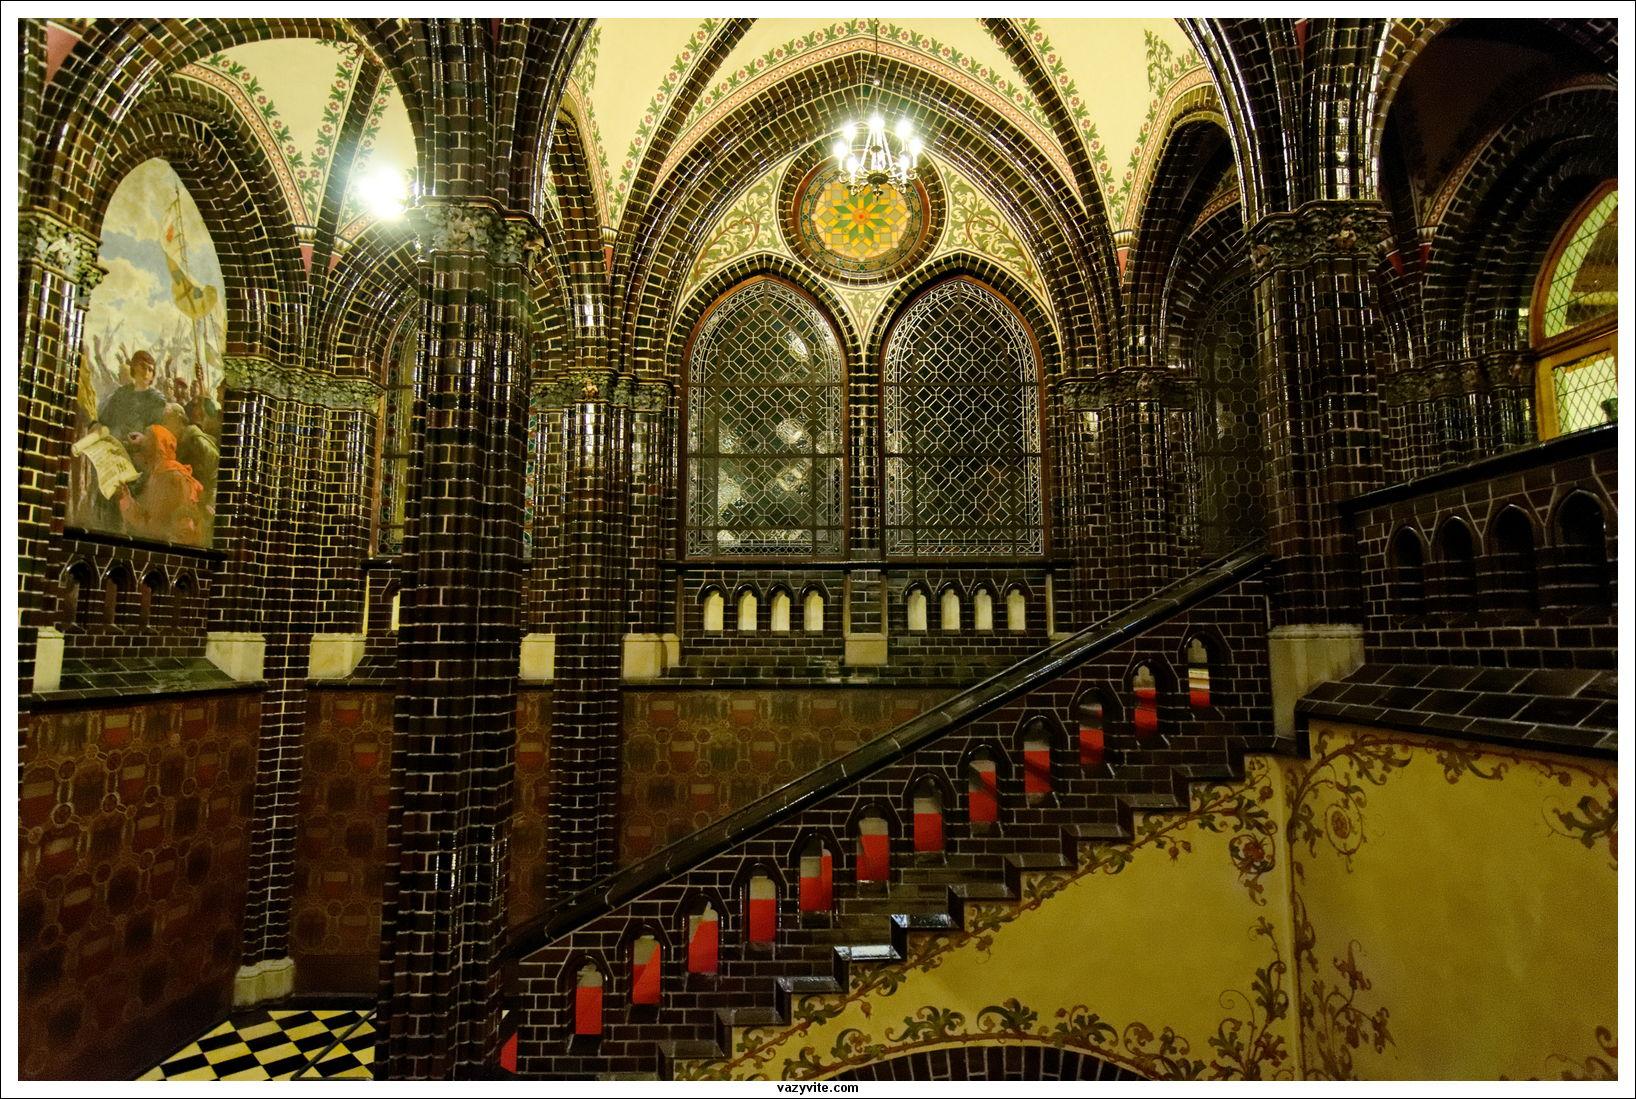 Interior stairwell (photo by vazyvite)